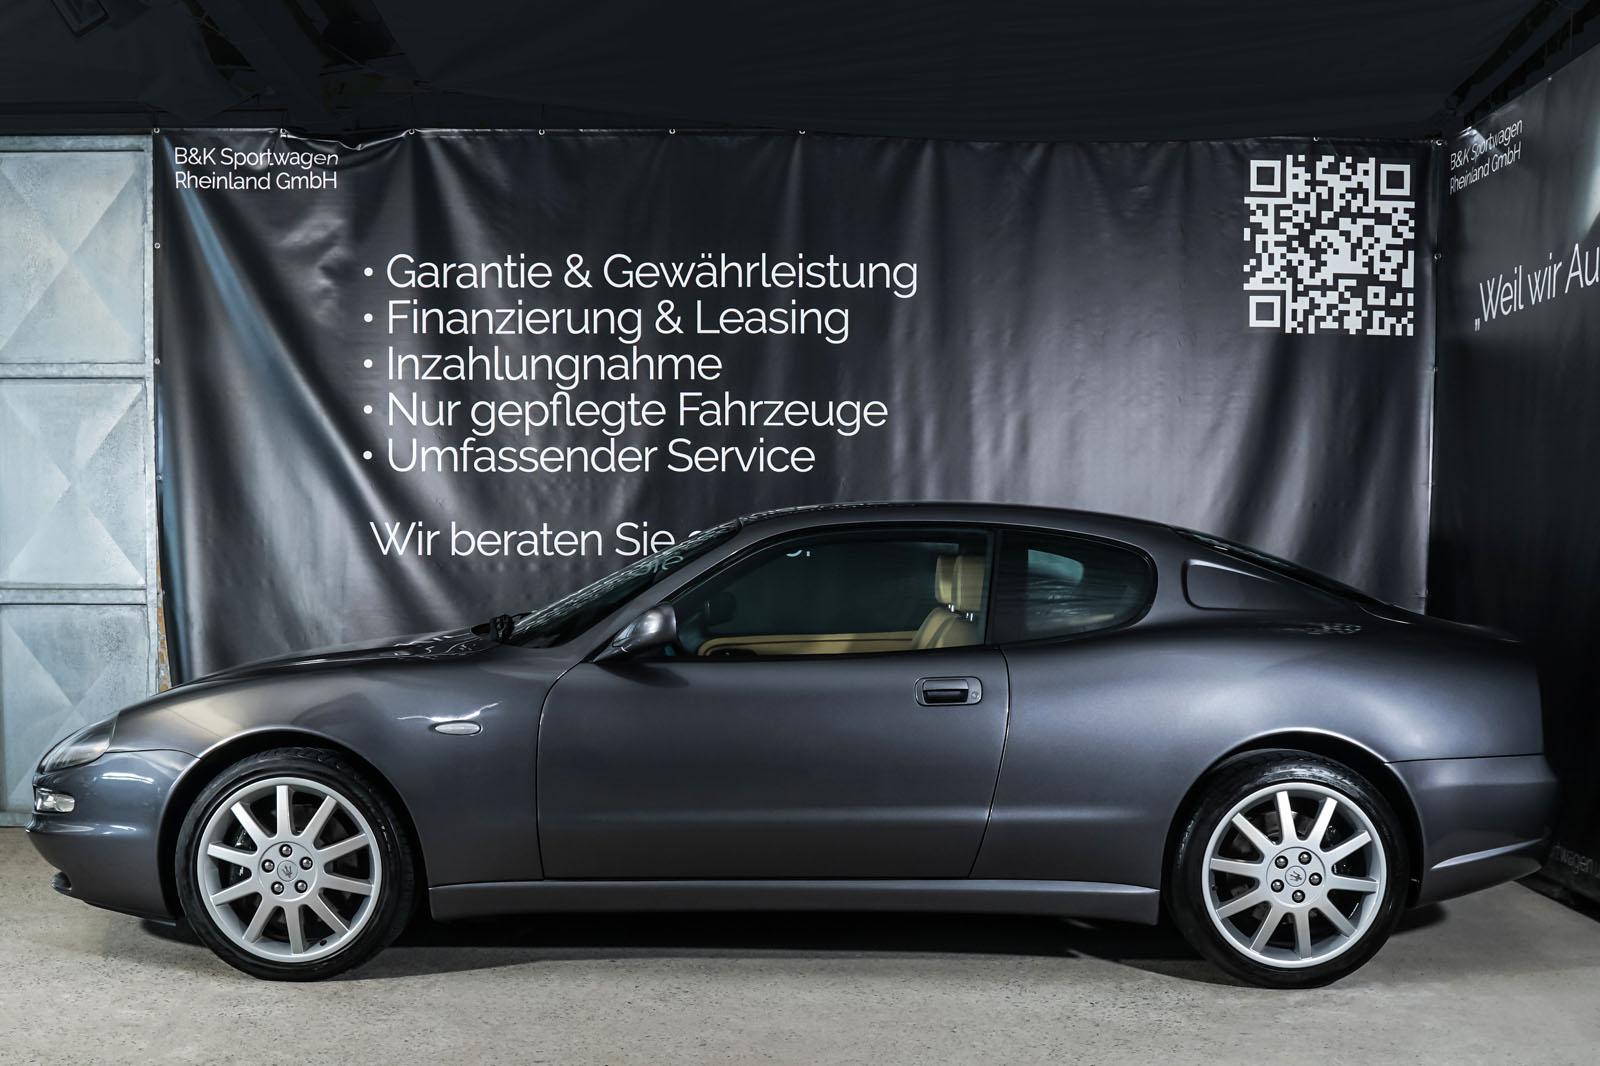 Maserati_3200_GTA_Grau_Beige_MAS-0874_5_w